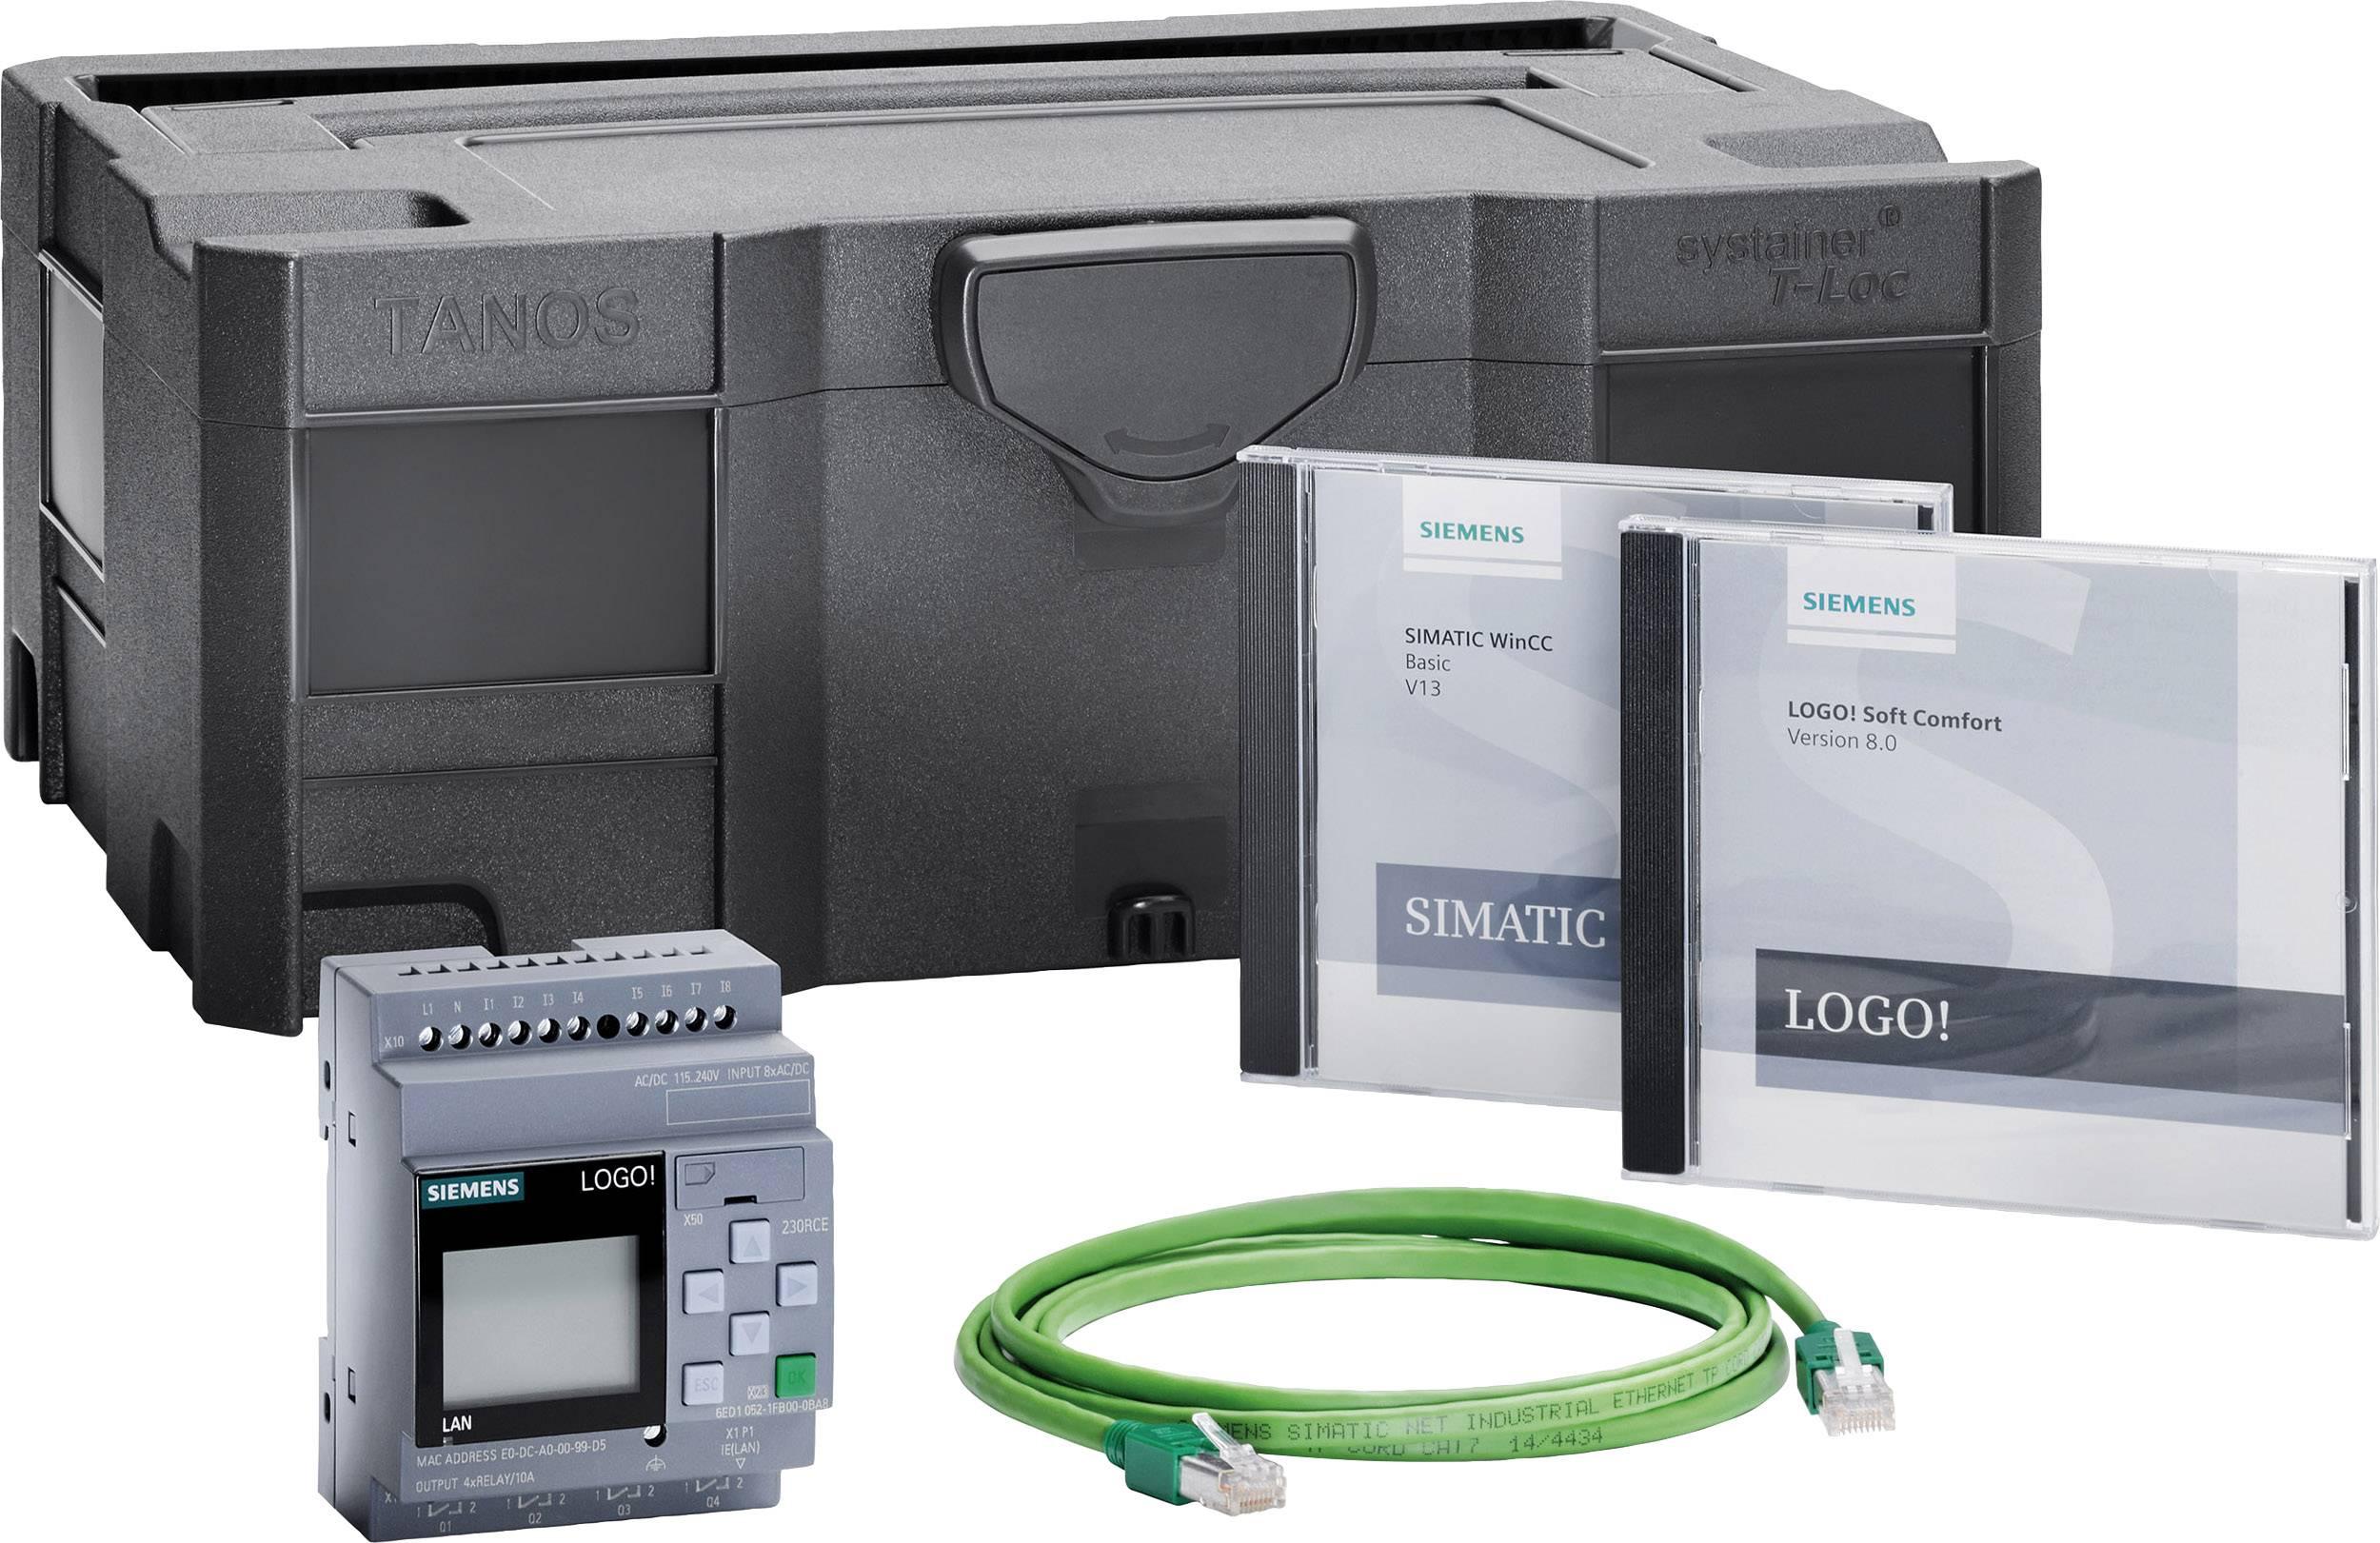 Startovací sada pro PLC Siemens LOGO! STARTER KIT 230RCE 6ED1057-3BA03-0AA8, 115 V/AC, 115 V/DC, 230 V/AC, 230 V/DC